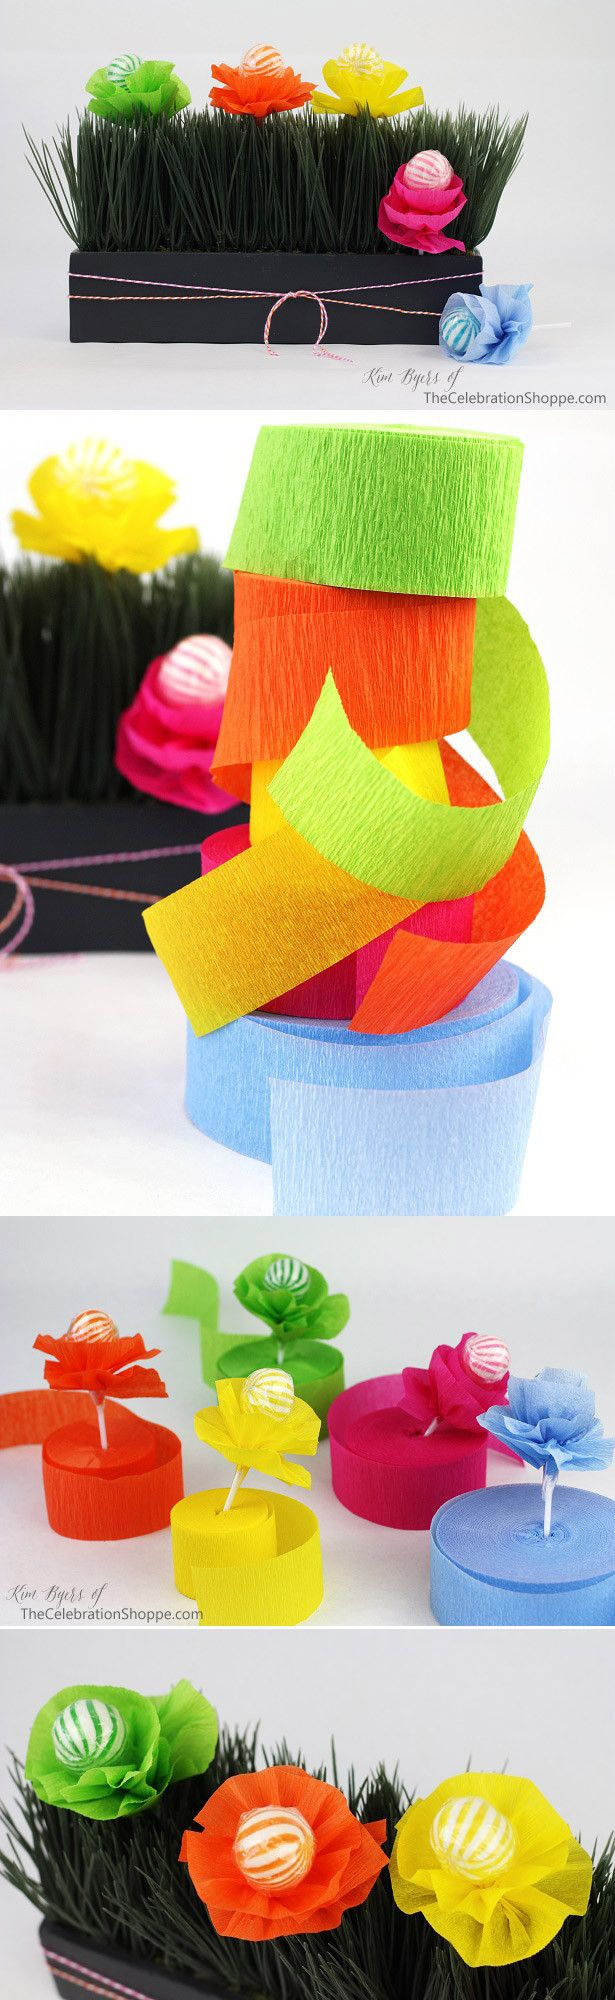 Make Crepe Paper Flower Lollipops for Easter or Mother's Day | Kim Byers, TheCelebrationShoppe.com